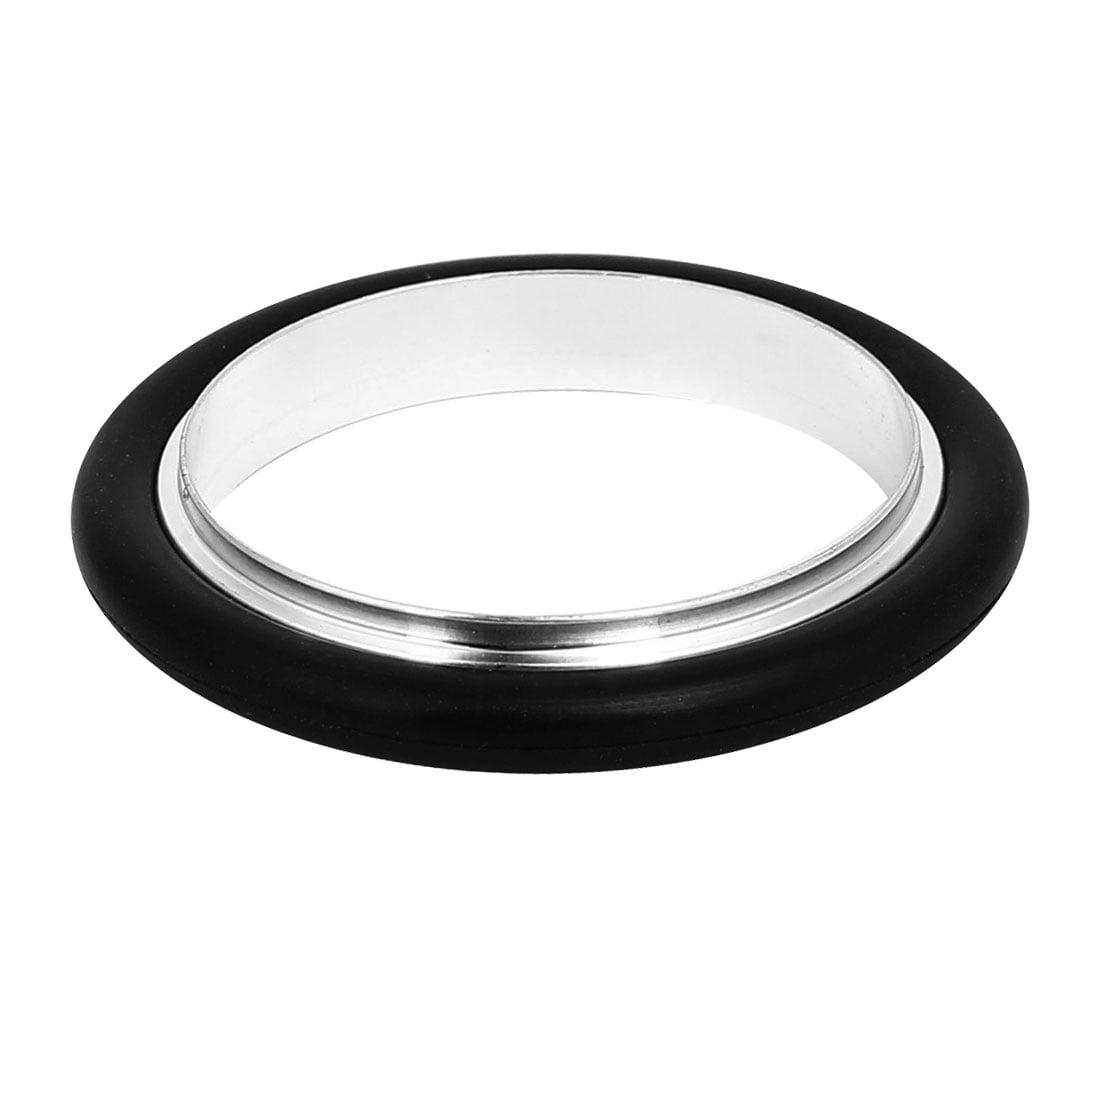 KF40 Aluminium Vacuum Pump Fittings Flange Centric Centering Ring O-Ring